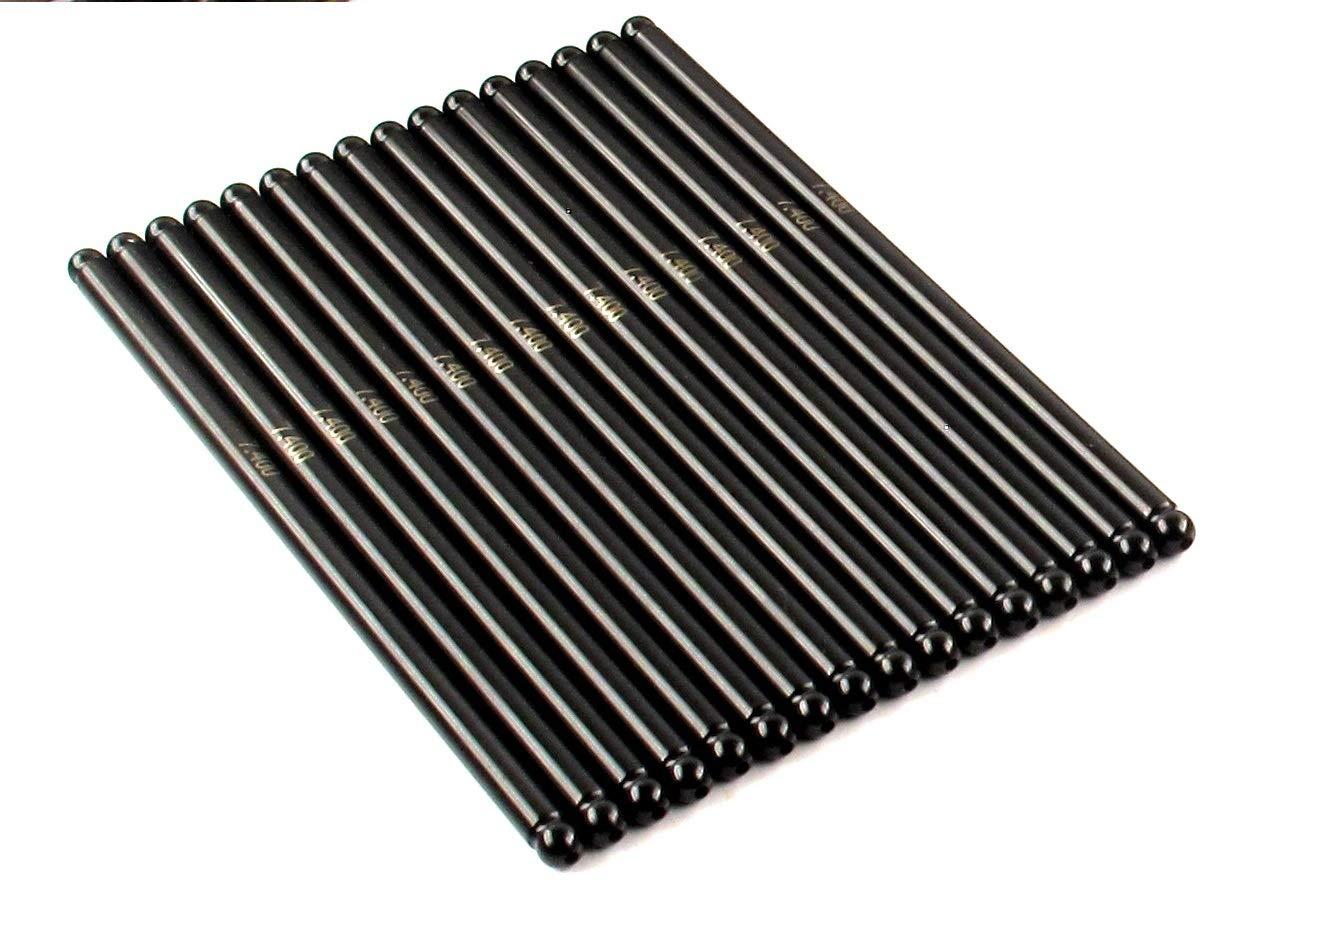 ELGIN Industries (Elgin, IL USA) Heat Treated 1010 Steel High Performance Pushrod Set of (16) compatible with 1999-2016 GM 4.8L, 5.3L,5.7L, 6.0L & 6.2L LS Engines